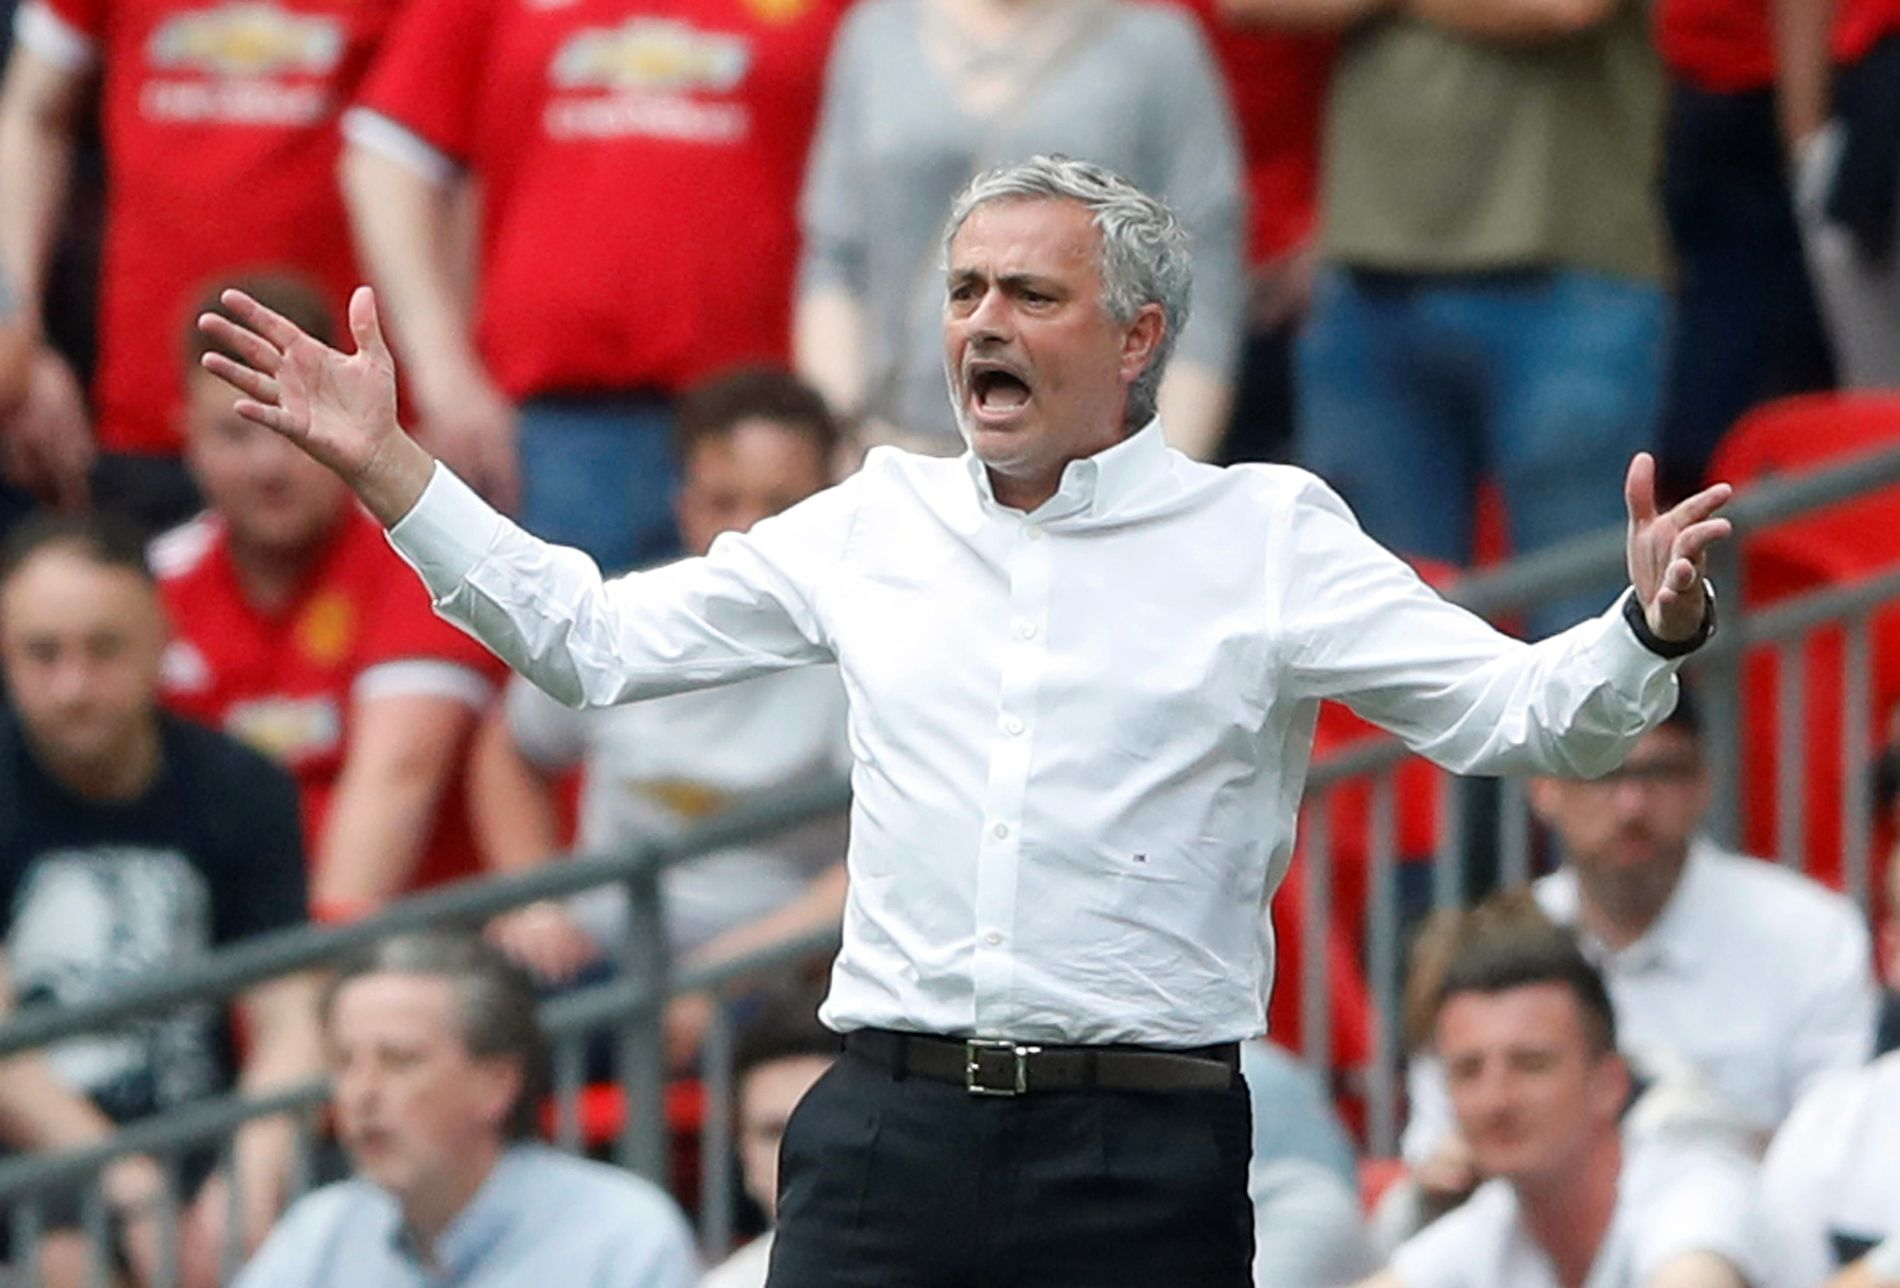 FINALEKLAR: Det manglet ikke på engasjement hos José Mourinho under FA cup-semifinalen mot Tottenham på Wembley lørdag.